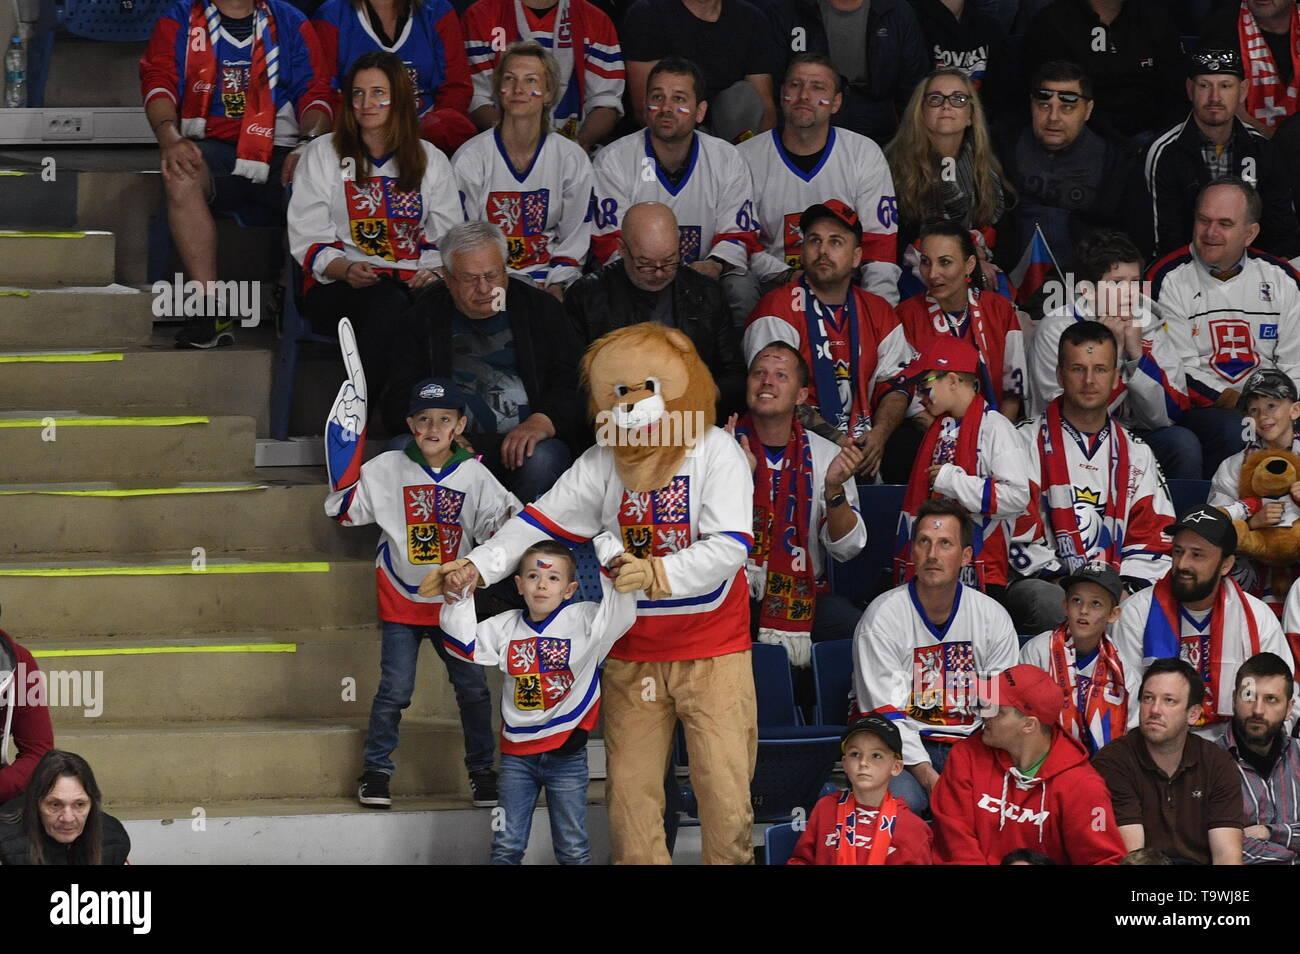 Bratislava, Slovakia. 21st May, 2019. Czech fans are seen during the match between Czech Republic and Switzerland within the 2019 IIHF World Championship in Bratislava, Slovakia, on May 21, 2019. Credit: Vit Simanek/CTK Photo/Alamy Live News Stock Photo